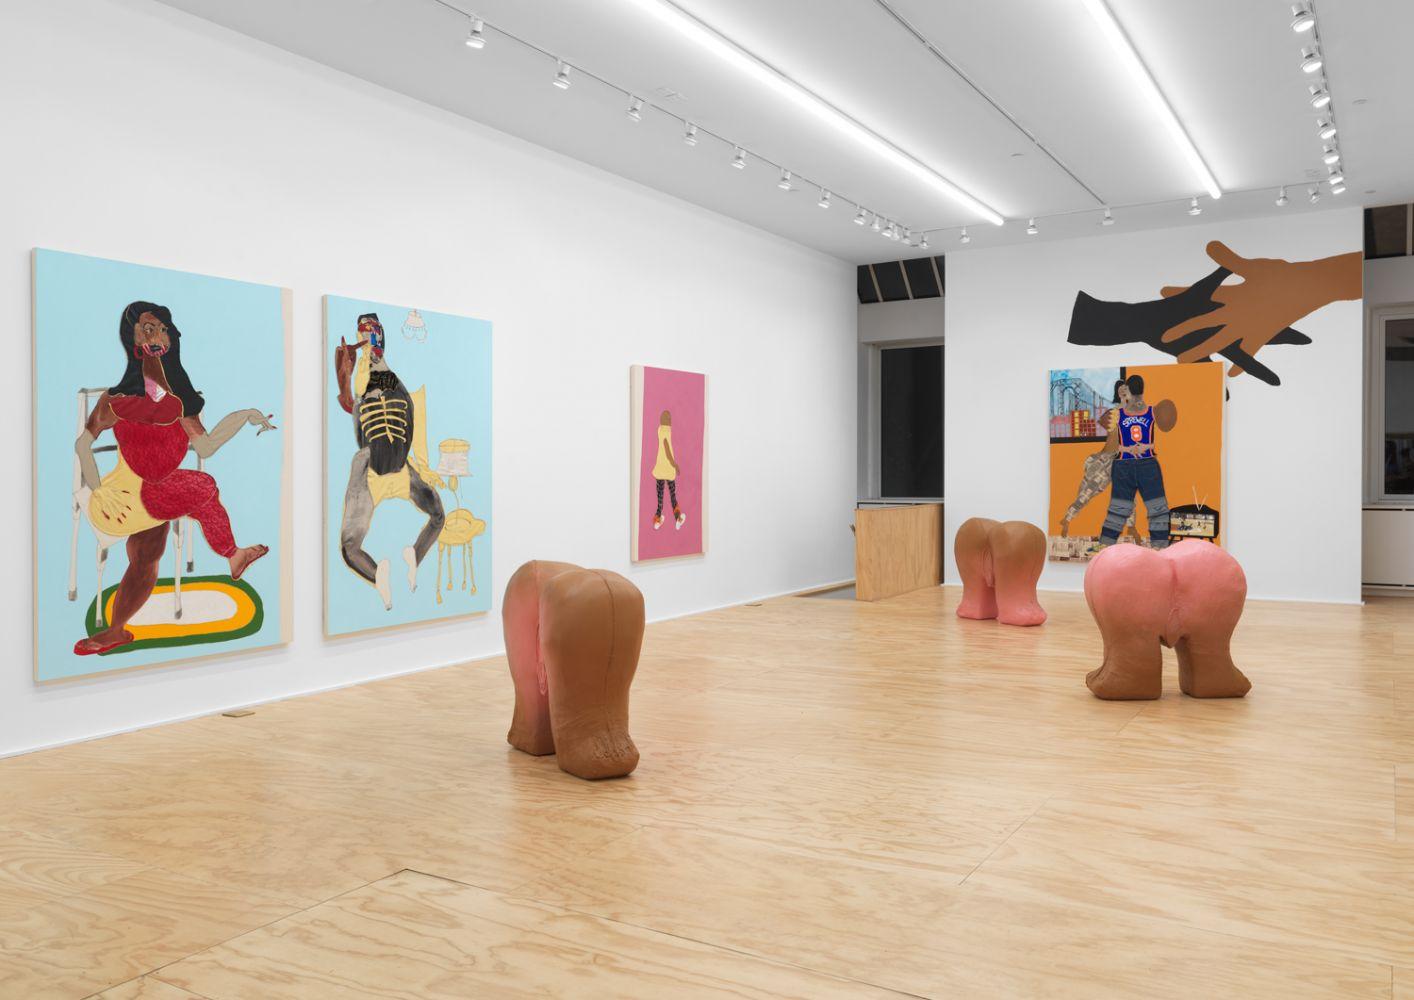 Exhibition View, Tschabalala Self, Cotton Mouth, Eva Presenhuber, New York, 2020 install 2